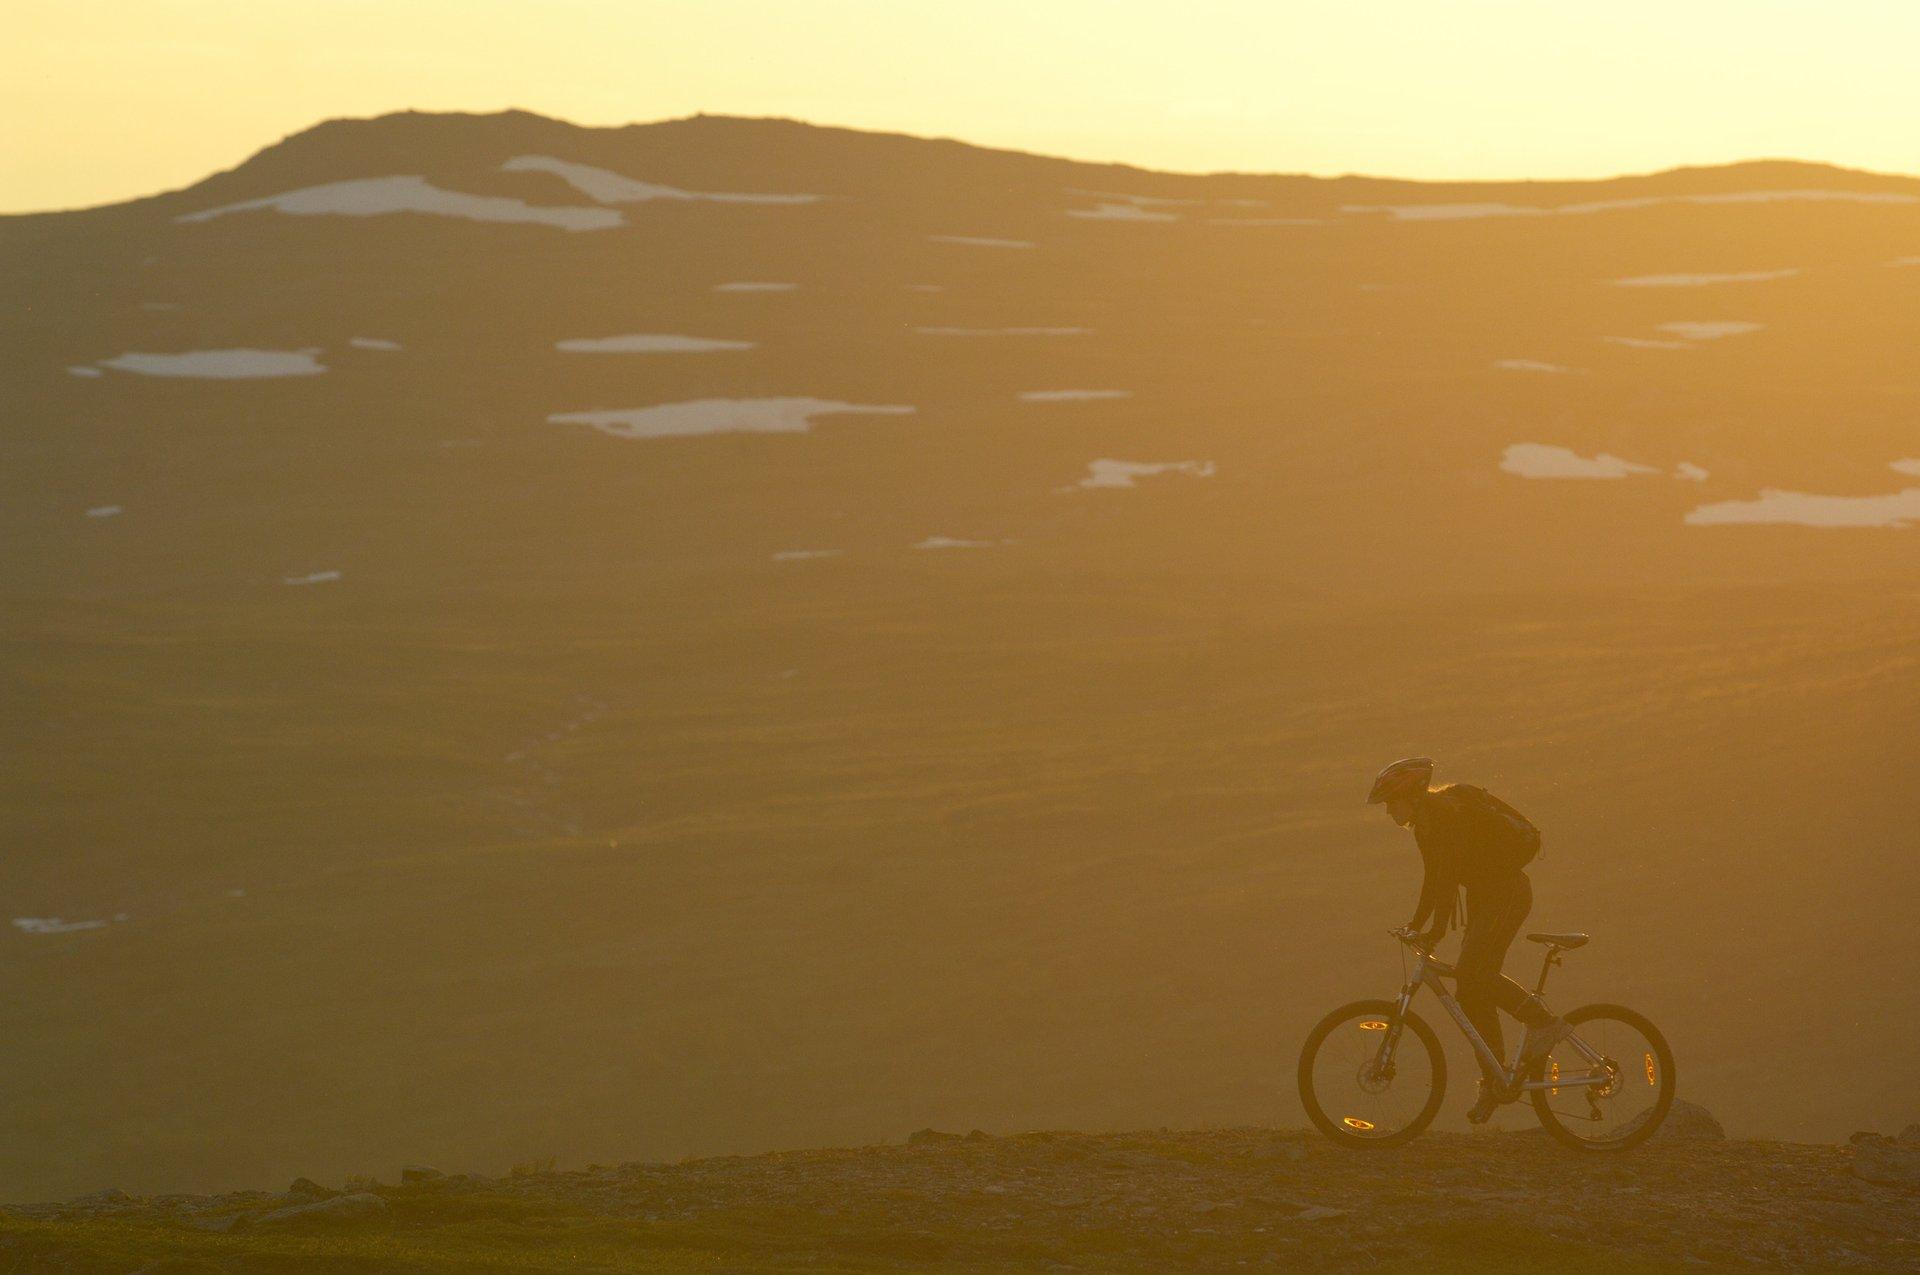 Best time for Biking in Sweden 2020